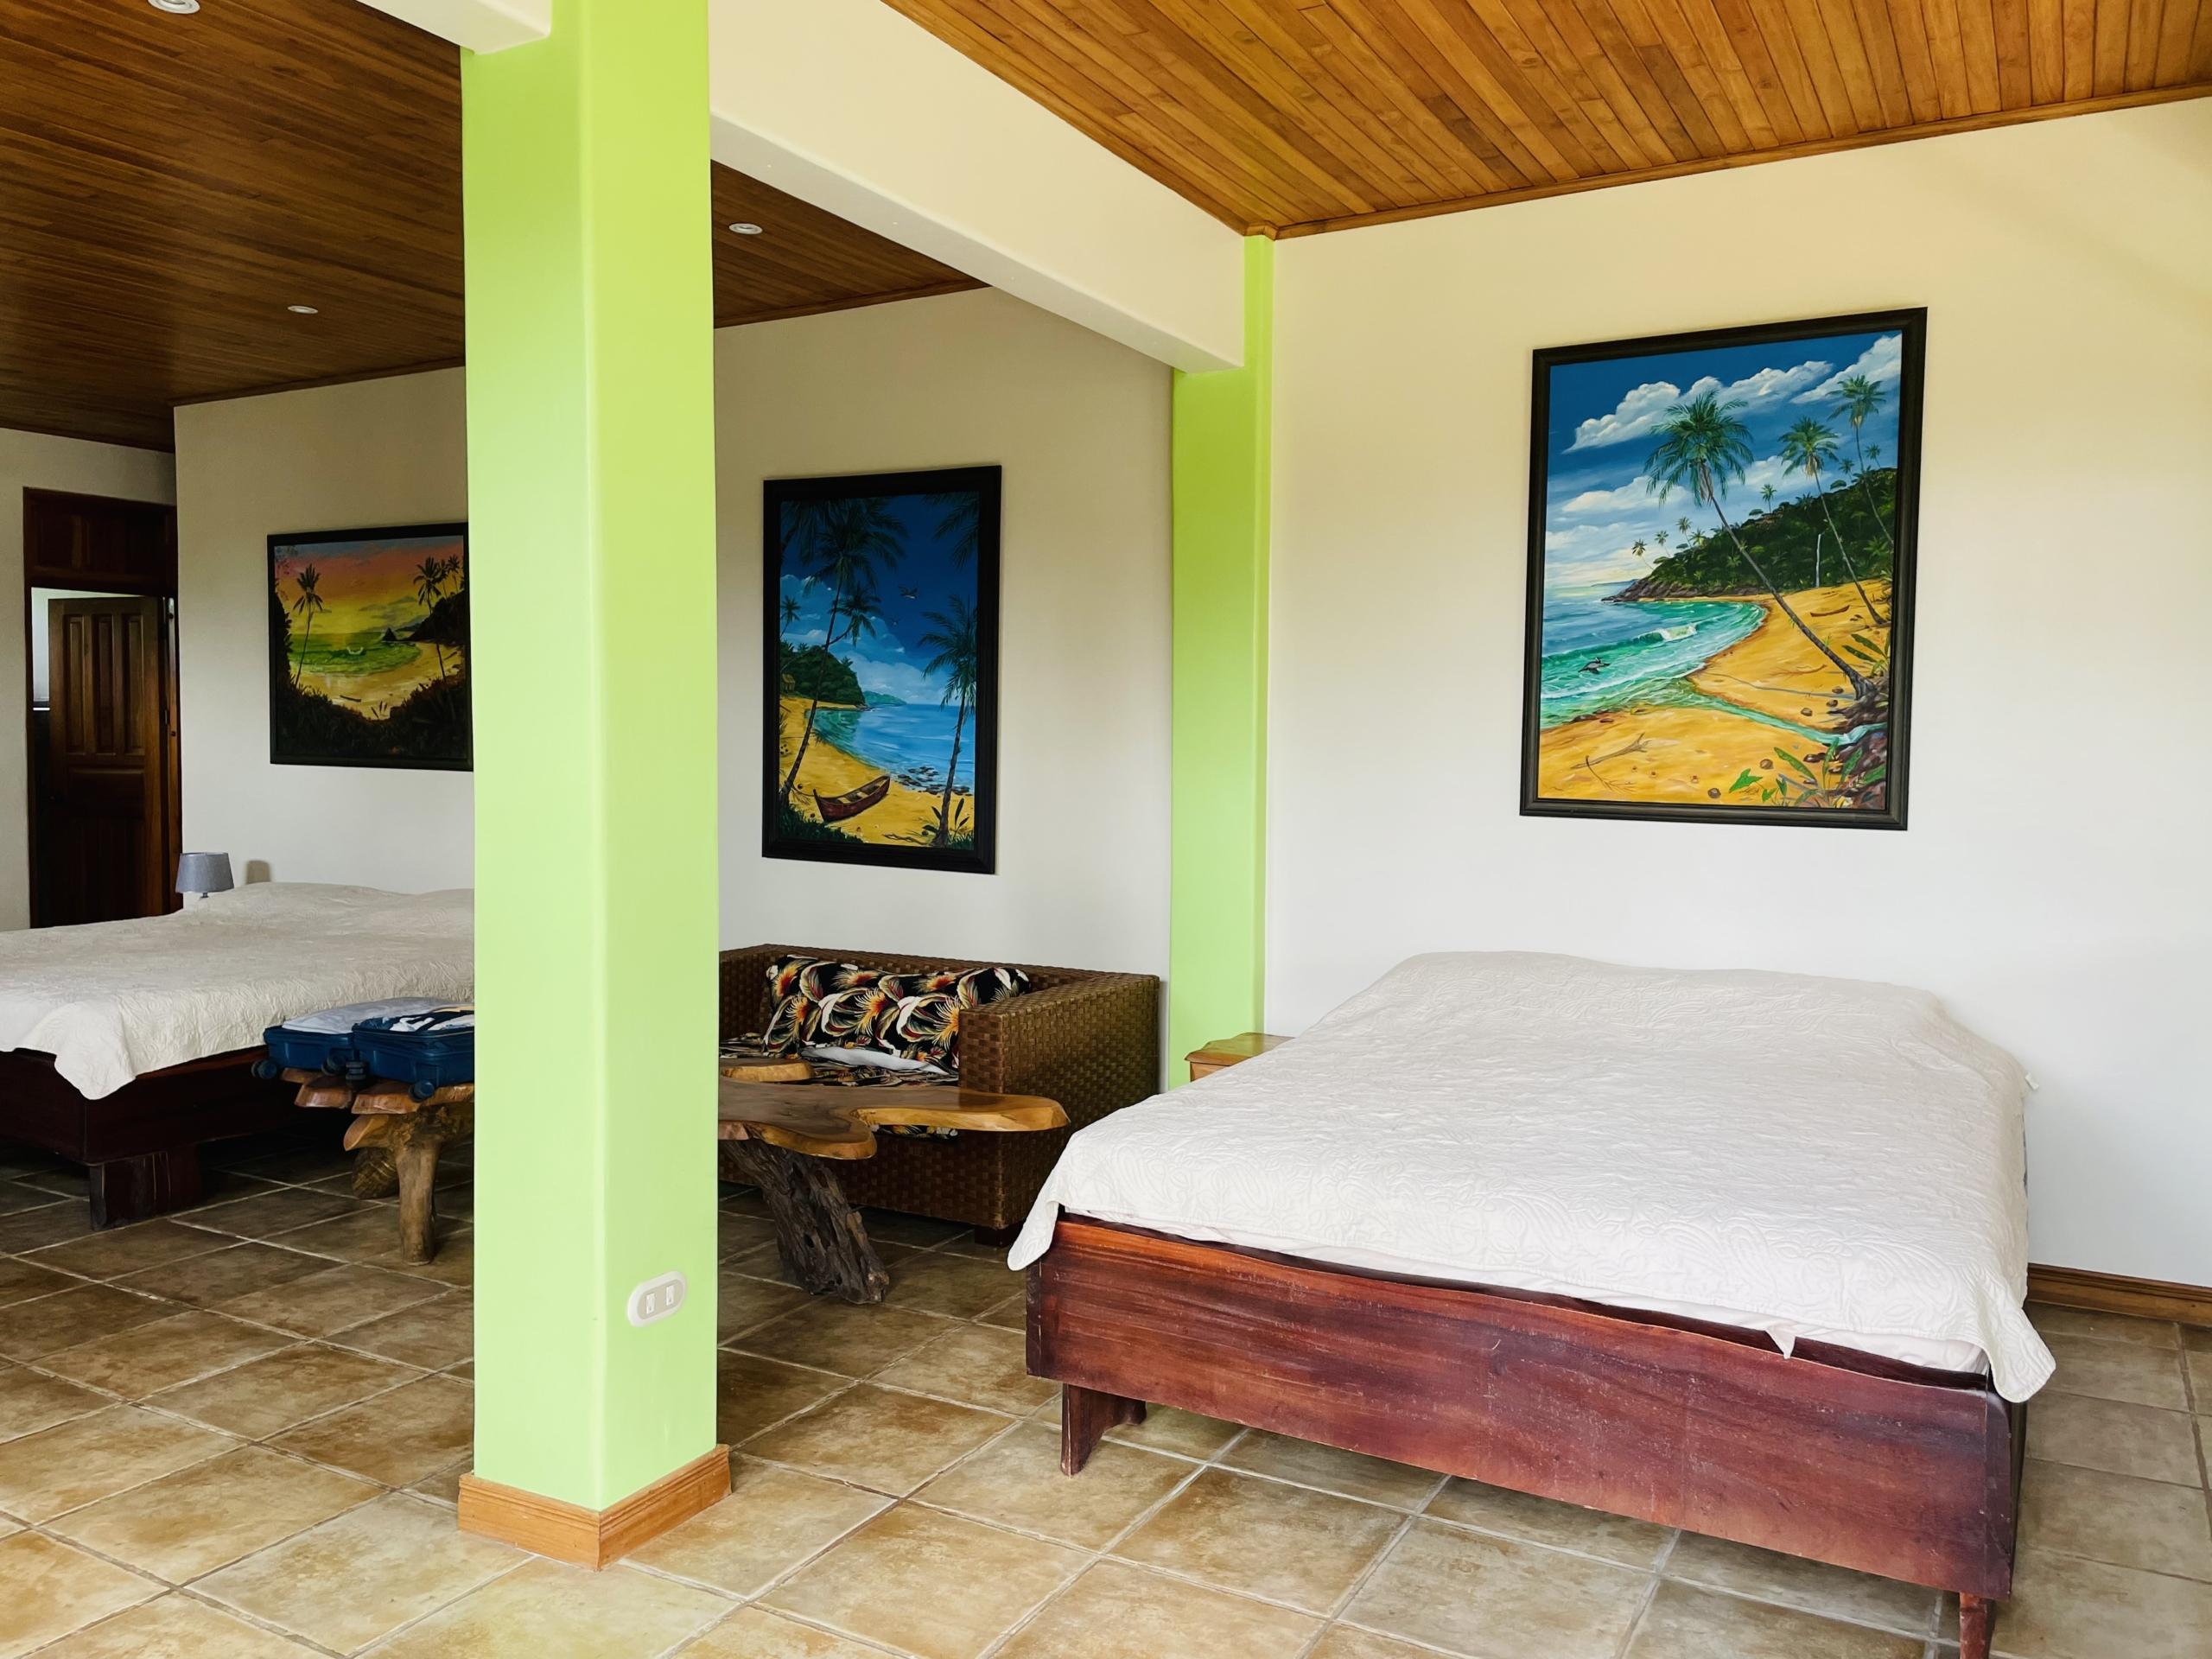 boca-barranca-master-bedroom